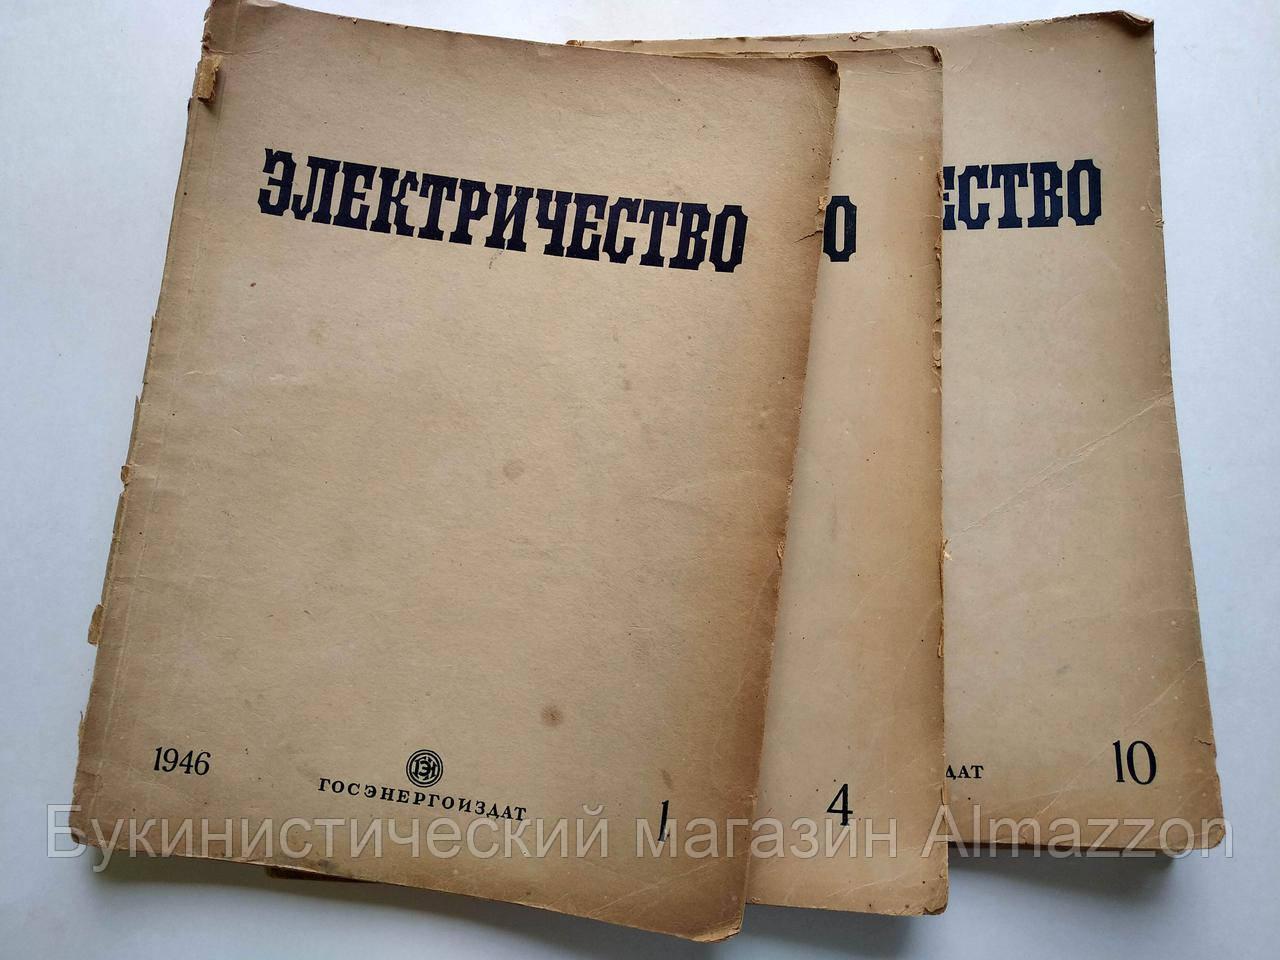 Журнал Электричество. 1946 год. Номера 1, 4, 10